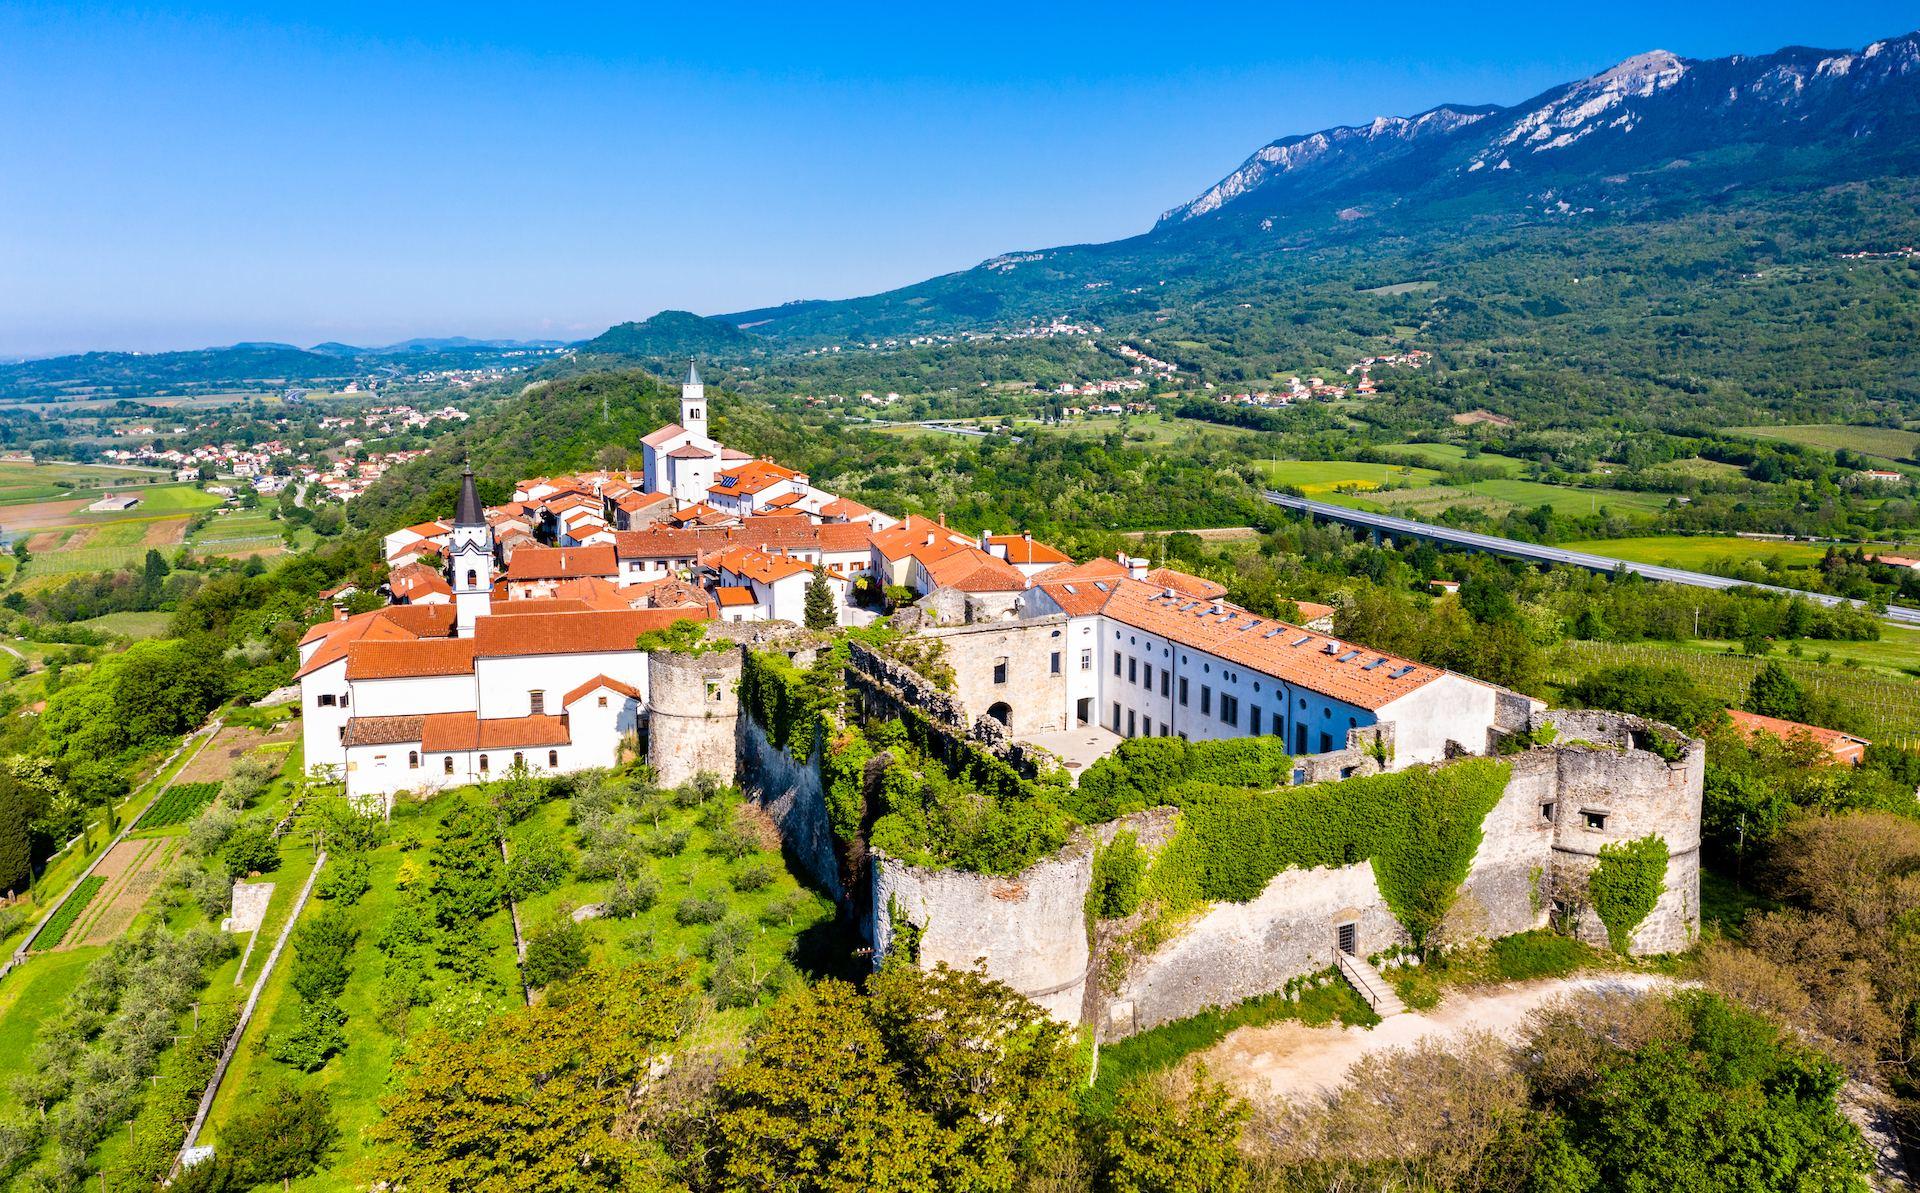 Vipavski Kriz, Vipavska Dolina, Slovinsko